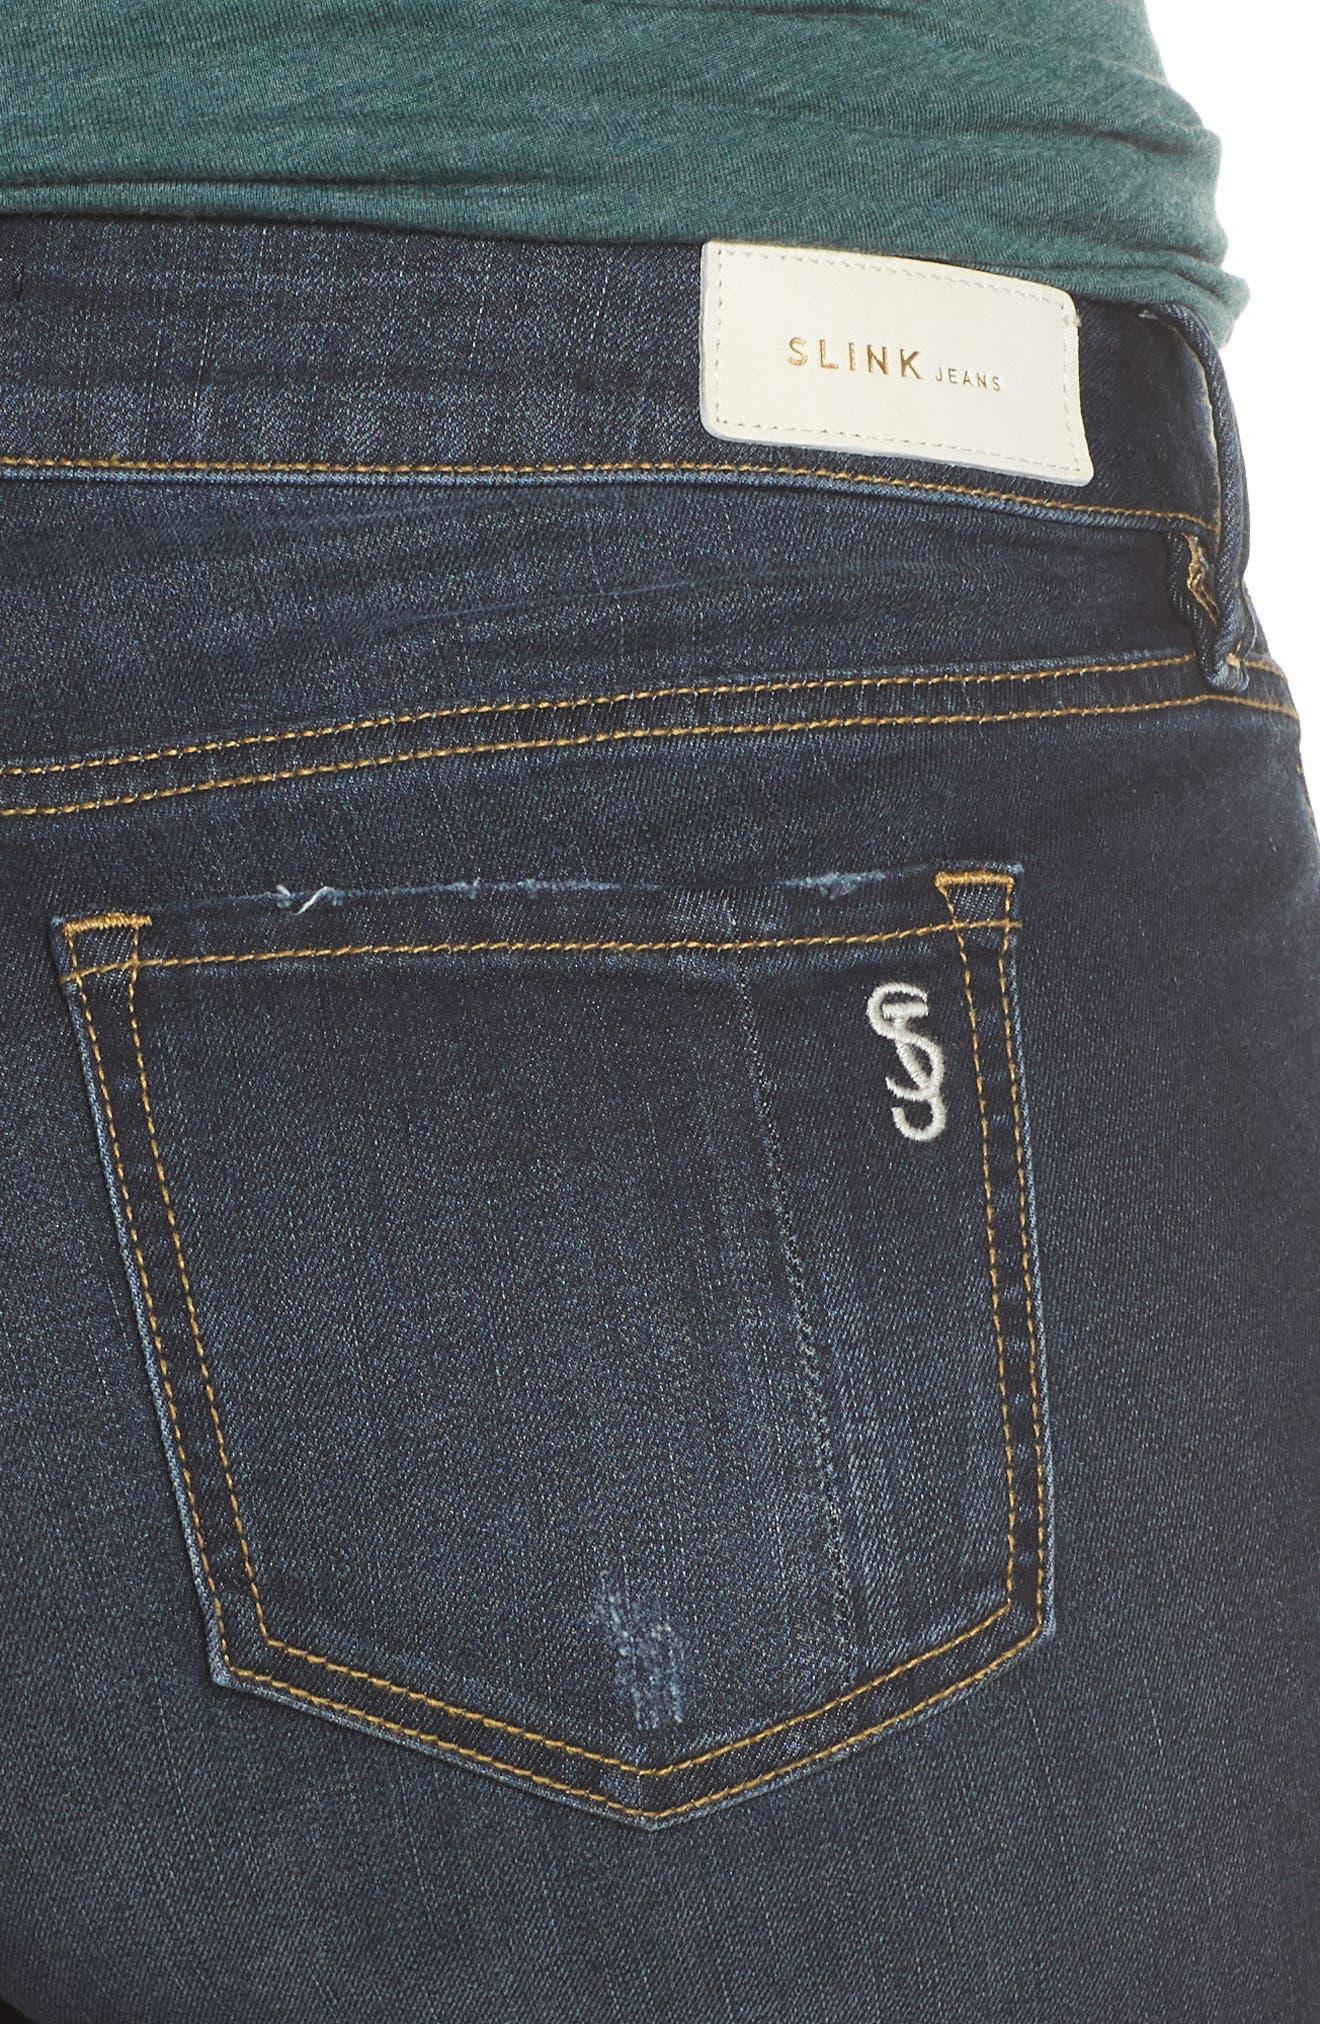 SLINK JEANS, Stretch Ankle Boyfriend Jeans, Alternate thumbnail 5, color, BELLA